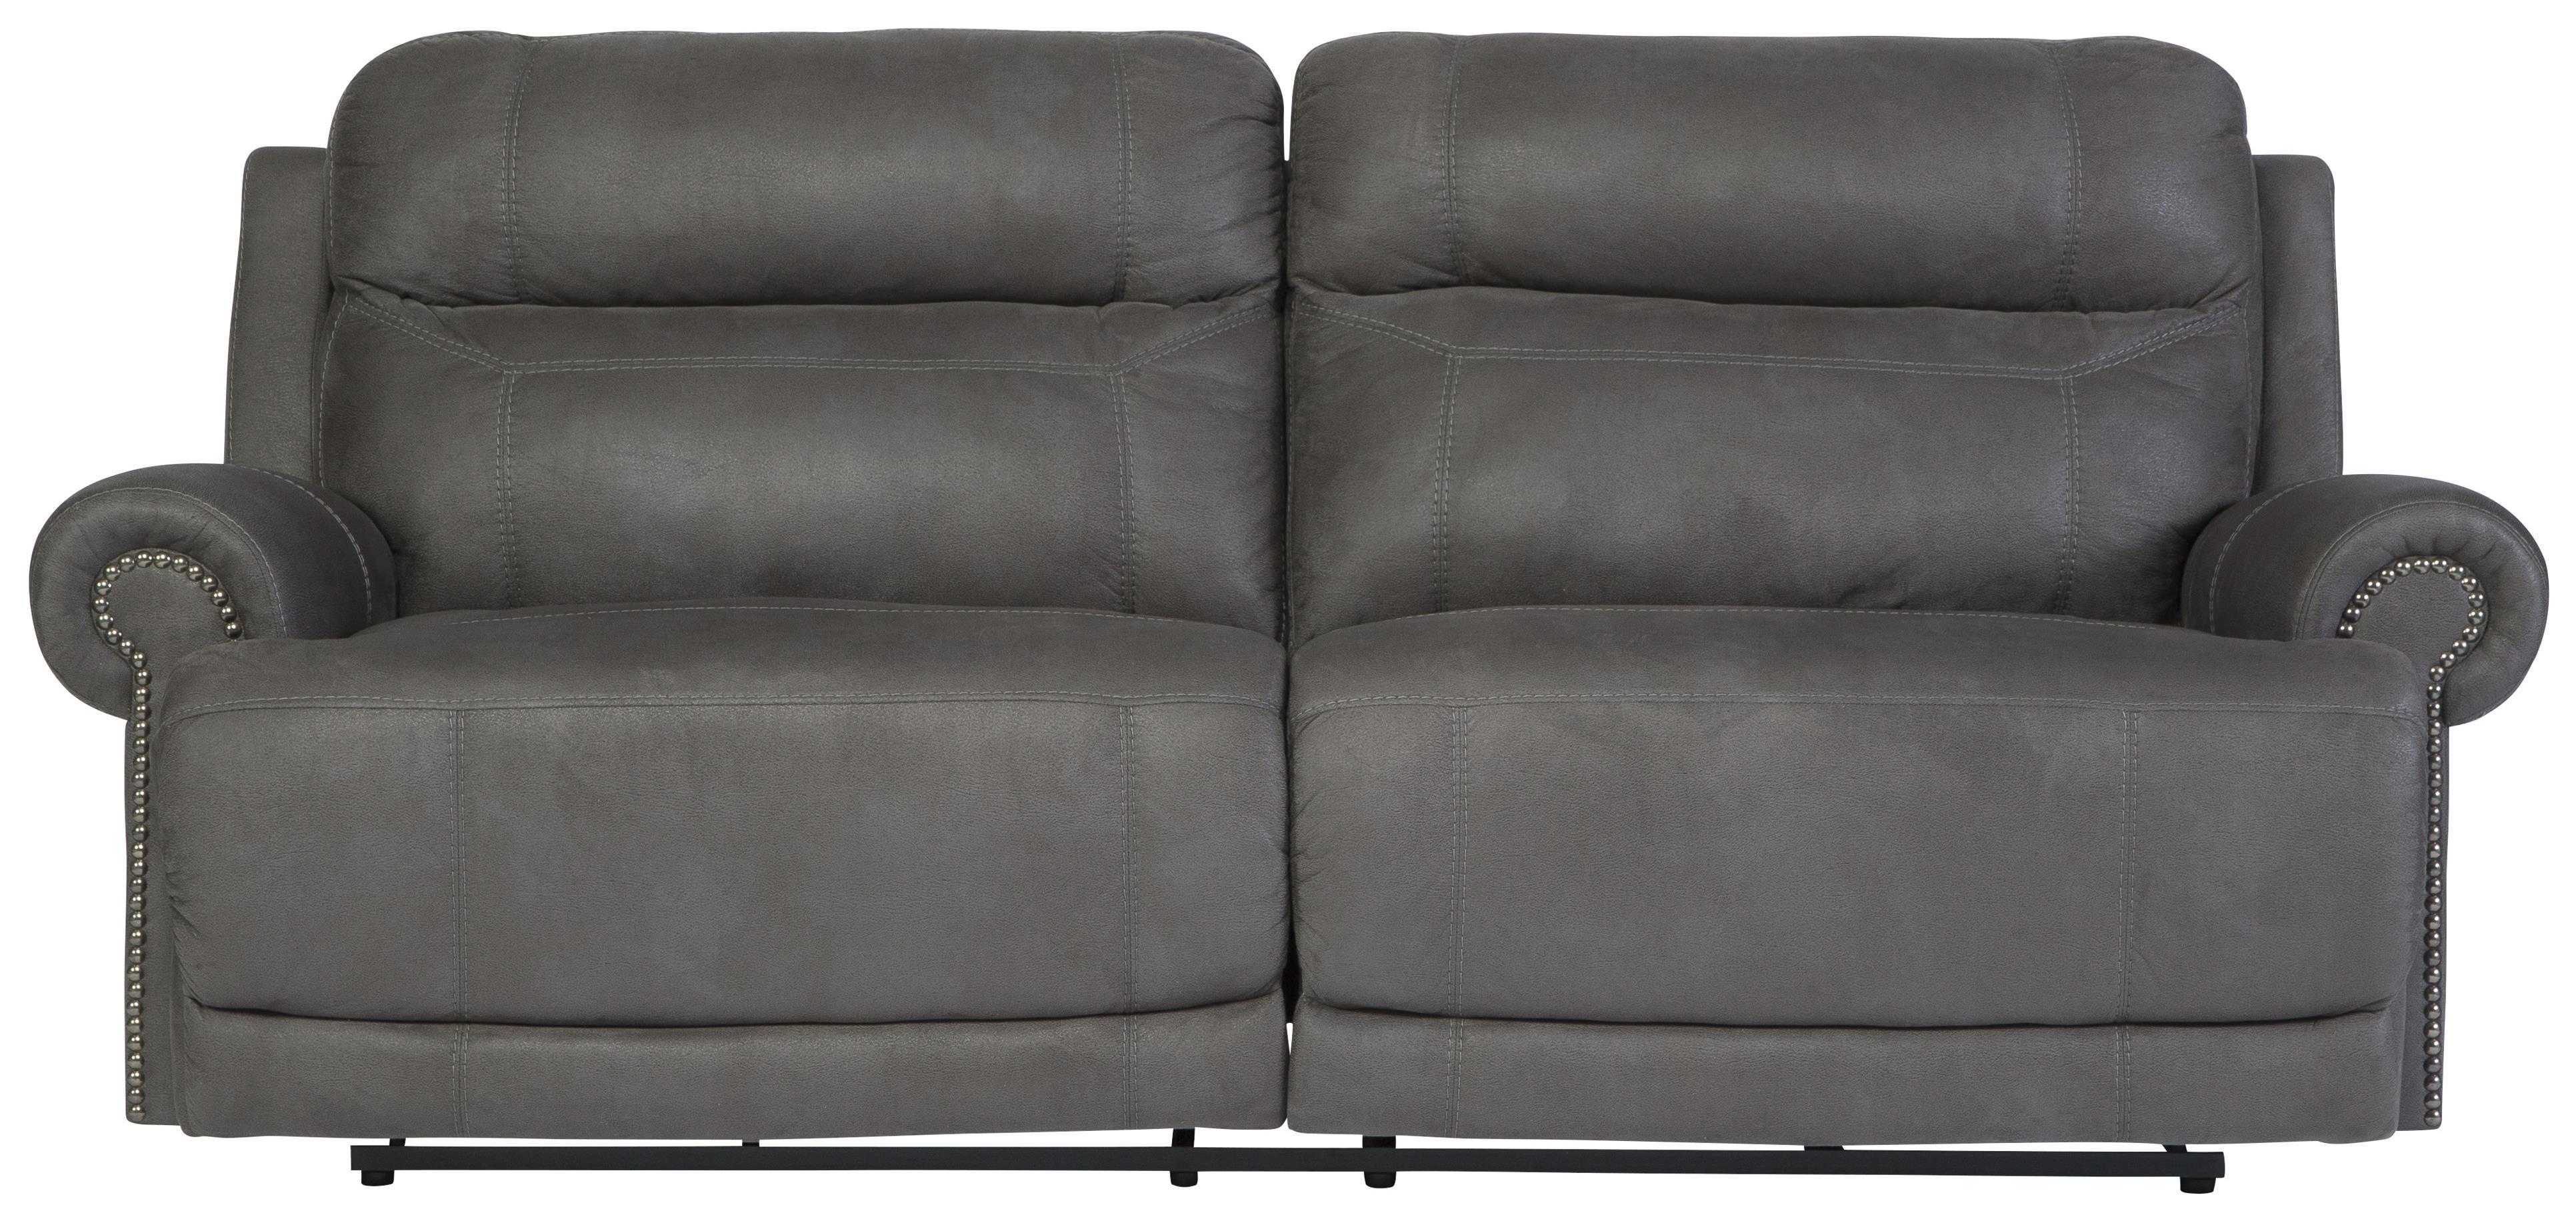 Signature Designashley Austere – Gray 2 Seat Reclining Sofa Inside 2 Seat Recliner Sofas (View 17 of 20)